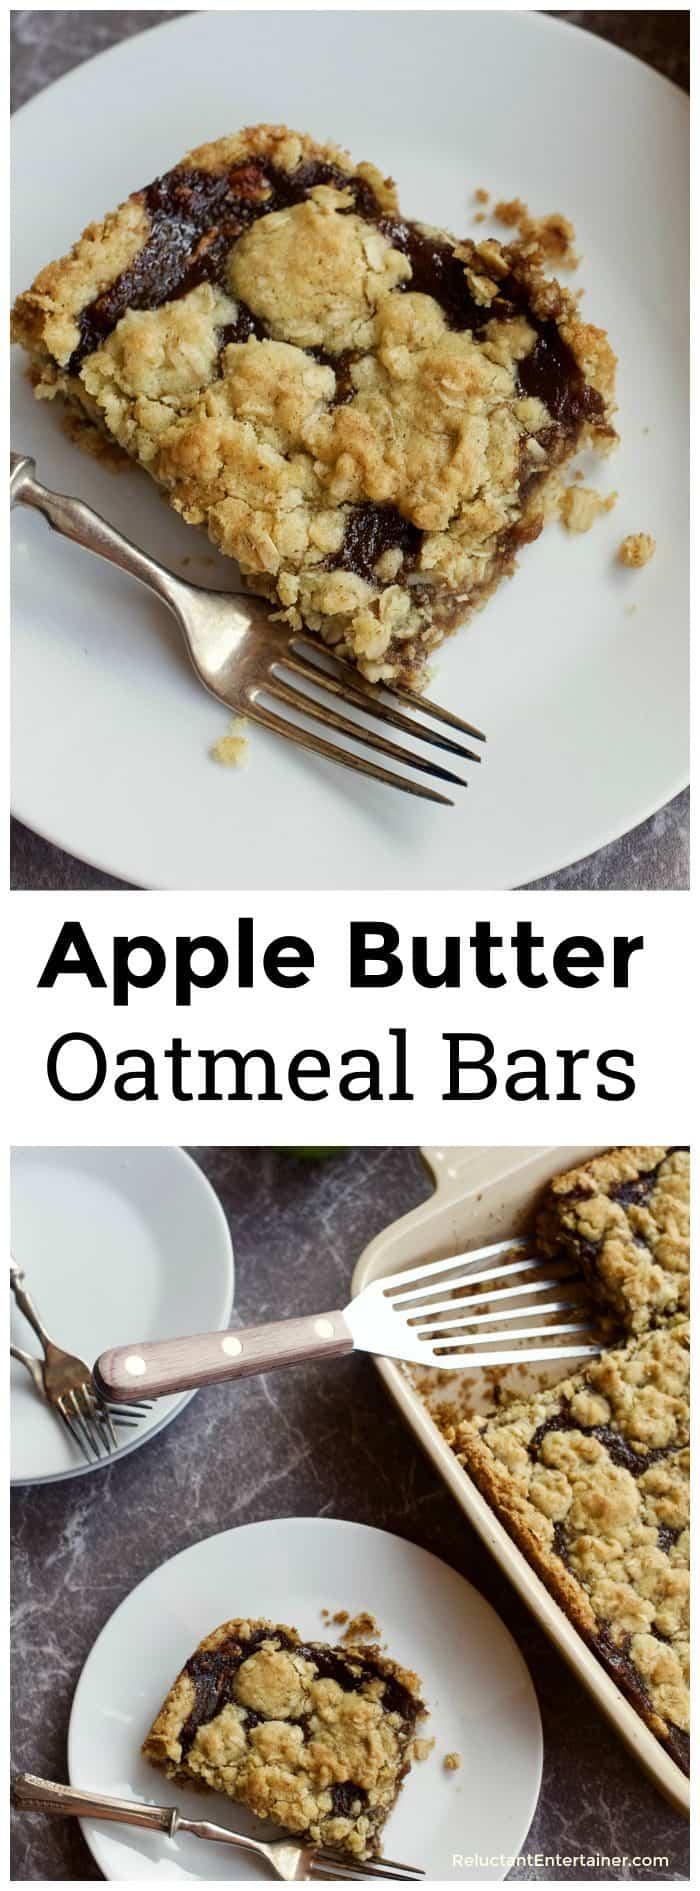 Apple Butter Oatmeal Bars Recipe